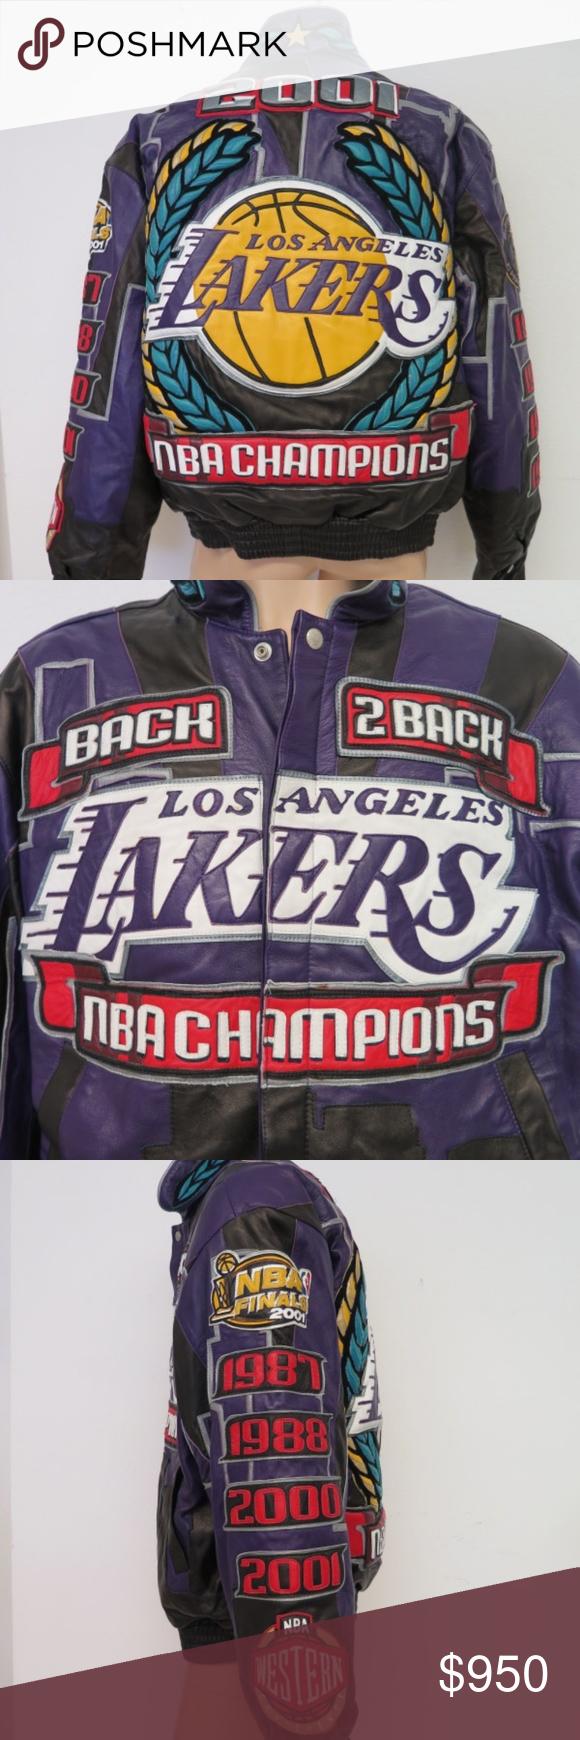 Jeff Hamilton Signed 2001 Lakers Jacket Ltd Ed Lakers Jacket Jackets Clothes Design